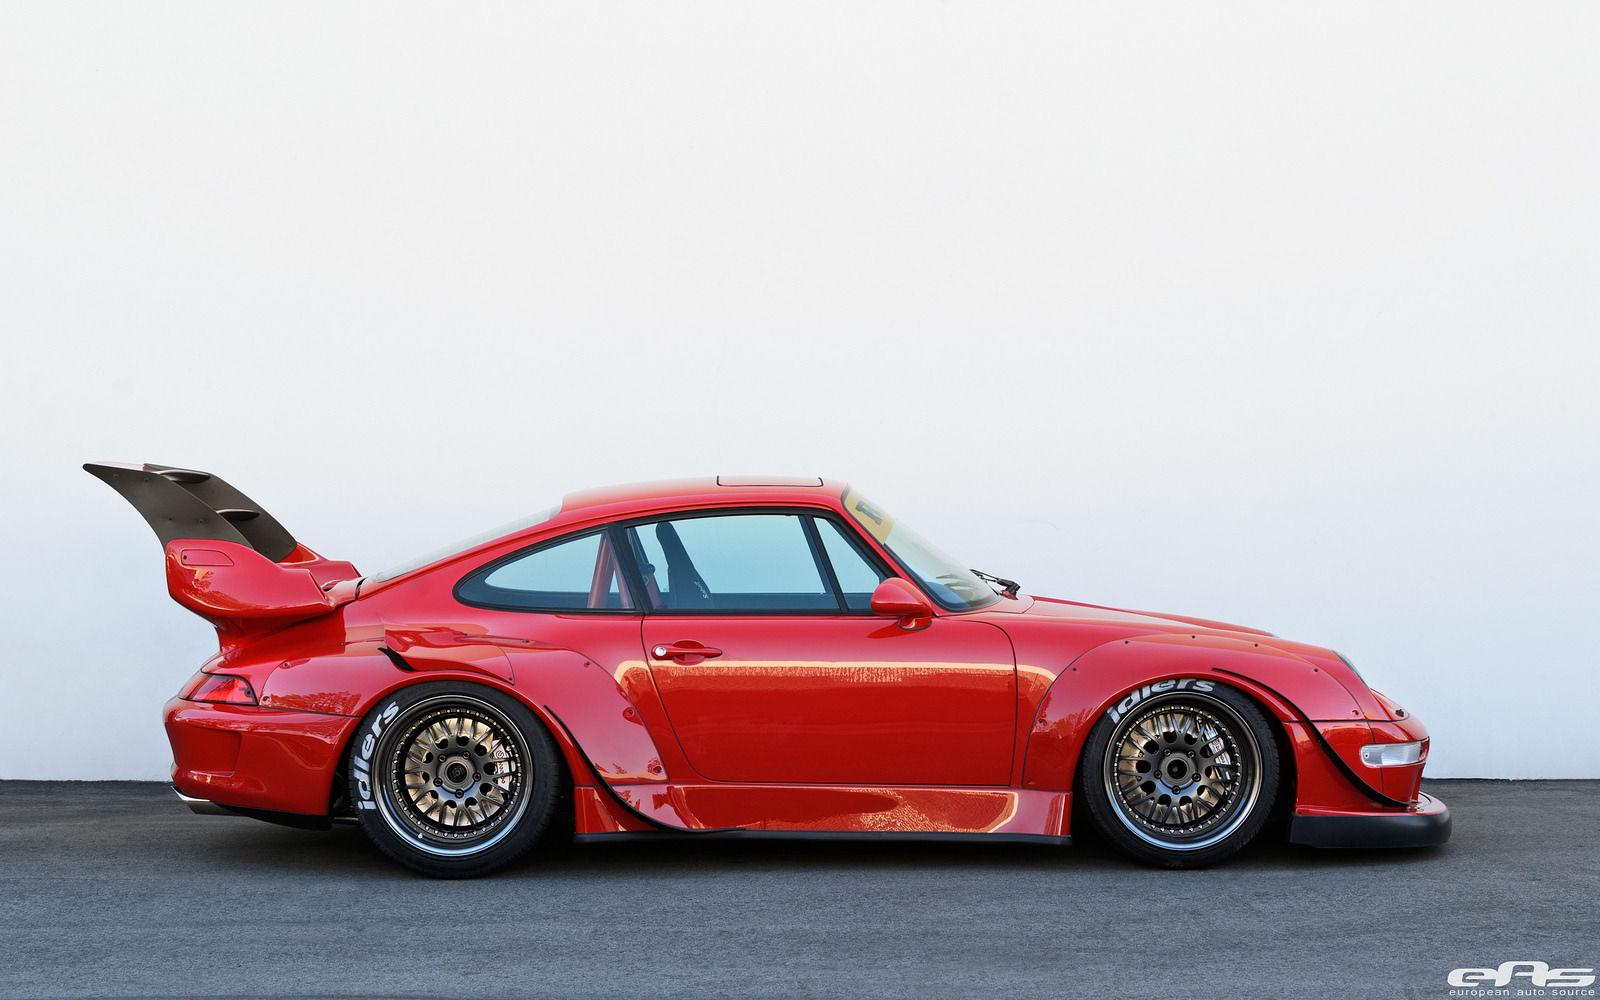 Porsche 993 Wallpapers Vehicles Hq Porsche 993 Pictures 4k Wallpapers 2019